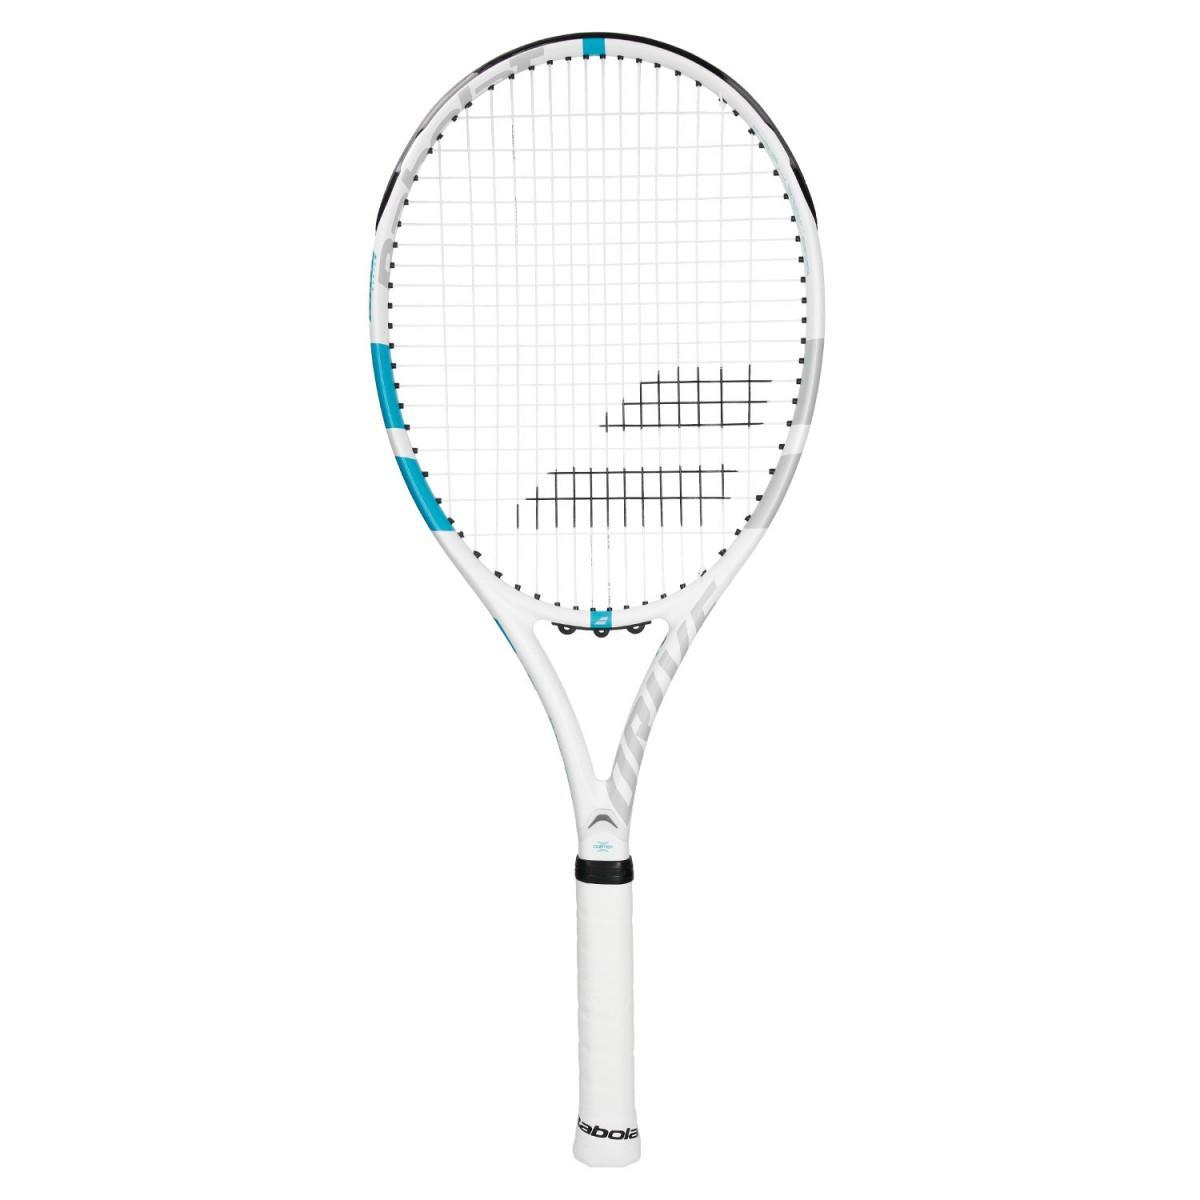 Теннисная ракетка Babolat Drive G Lite white/blue 2018